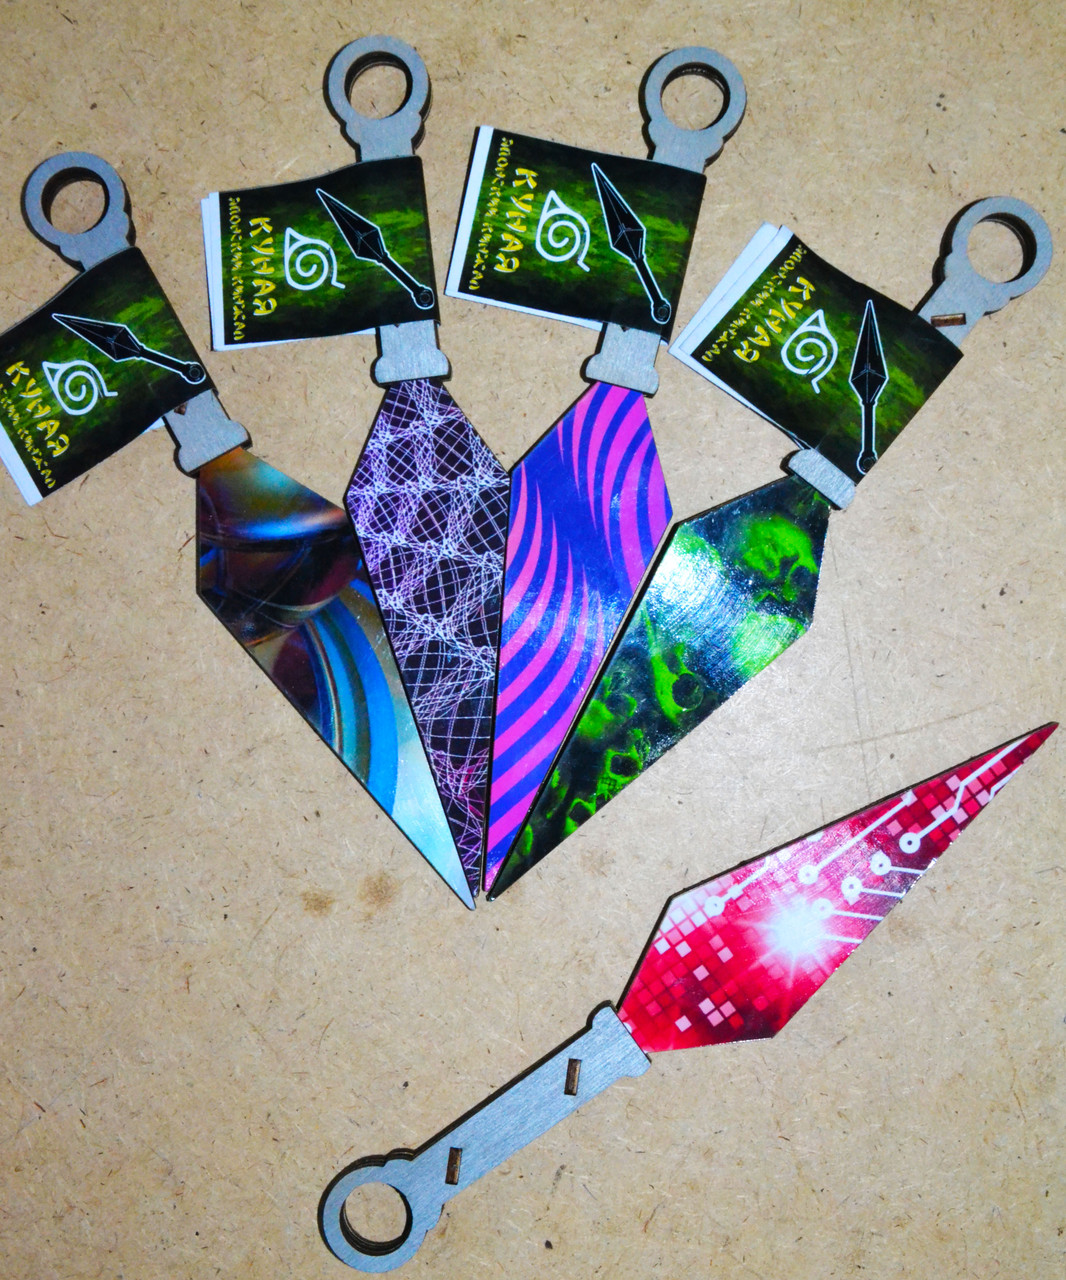 Нож пика - сувенир из дерева (ручная работа)#made in KZ